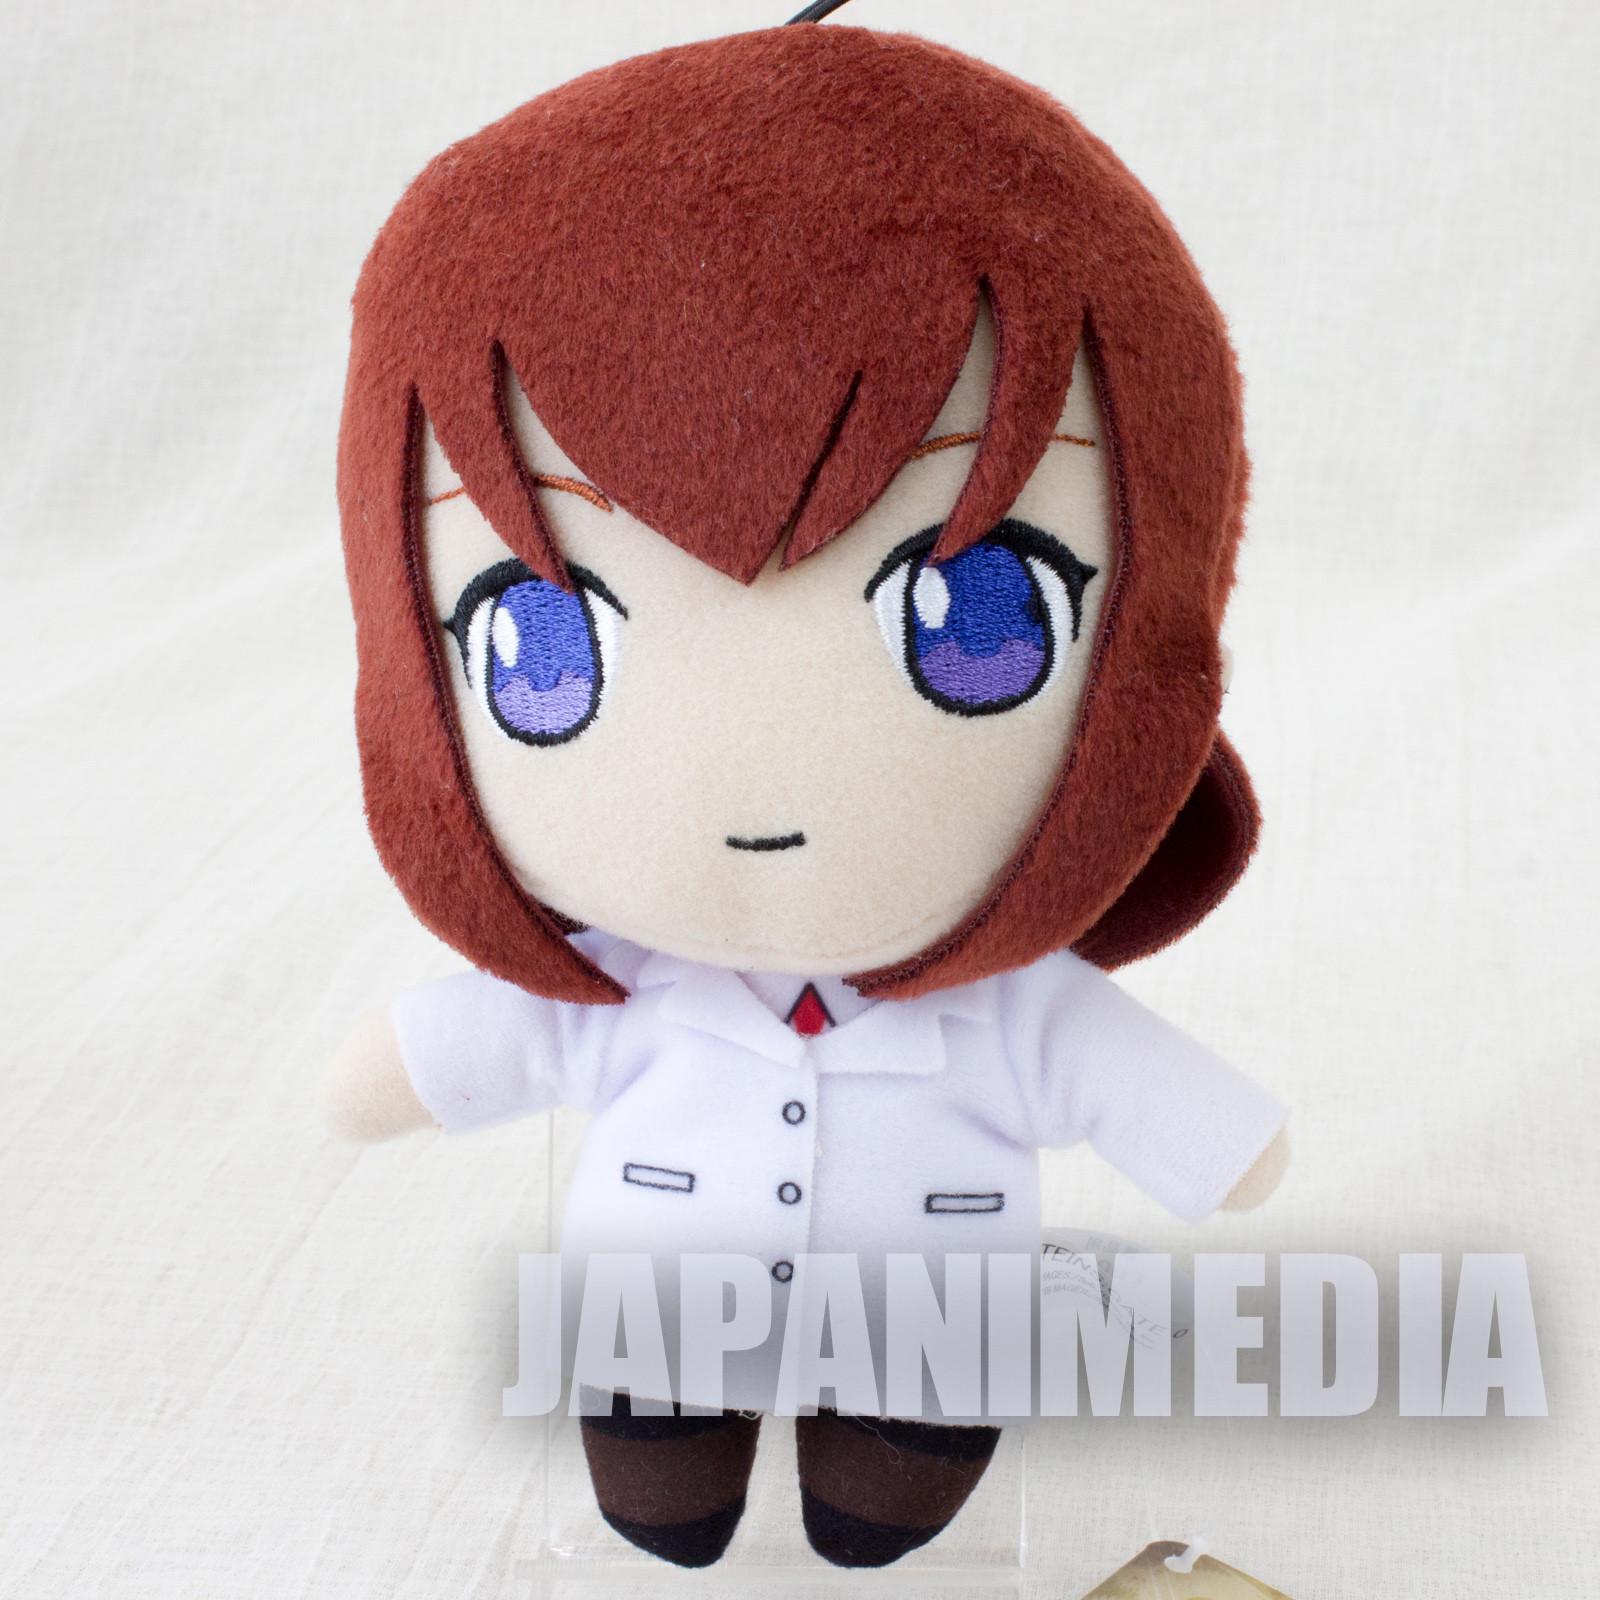 Steins ; Gate 0 Kurisu Makise Mini Plush Doll